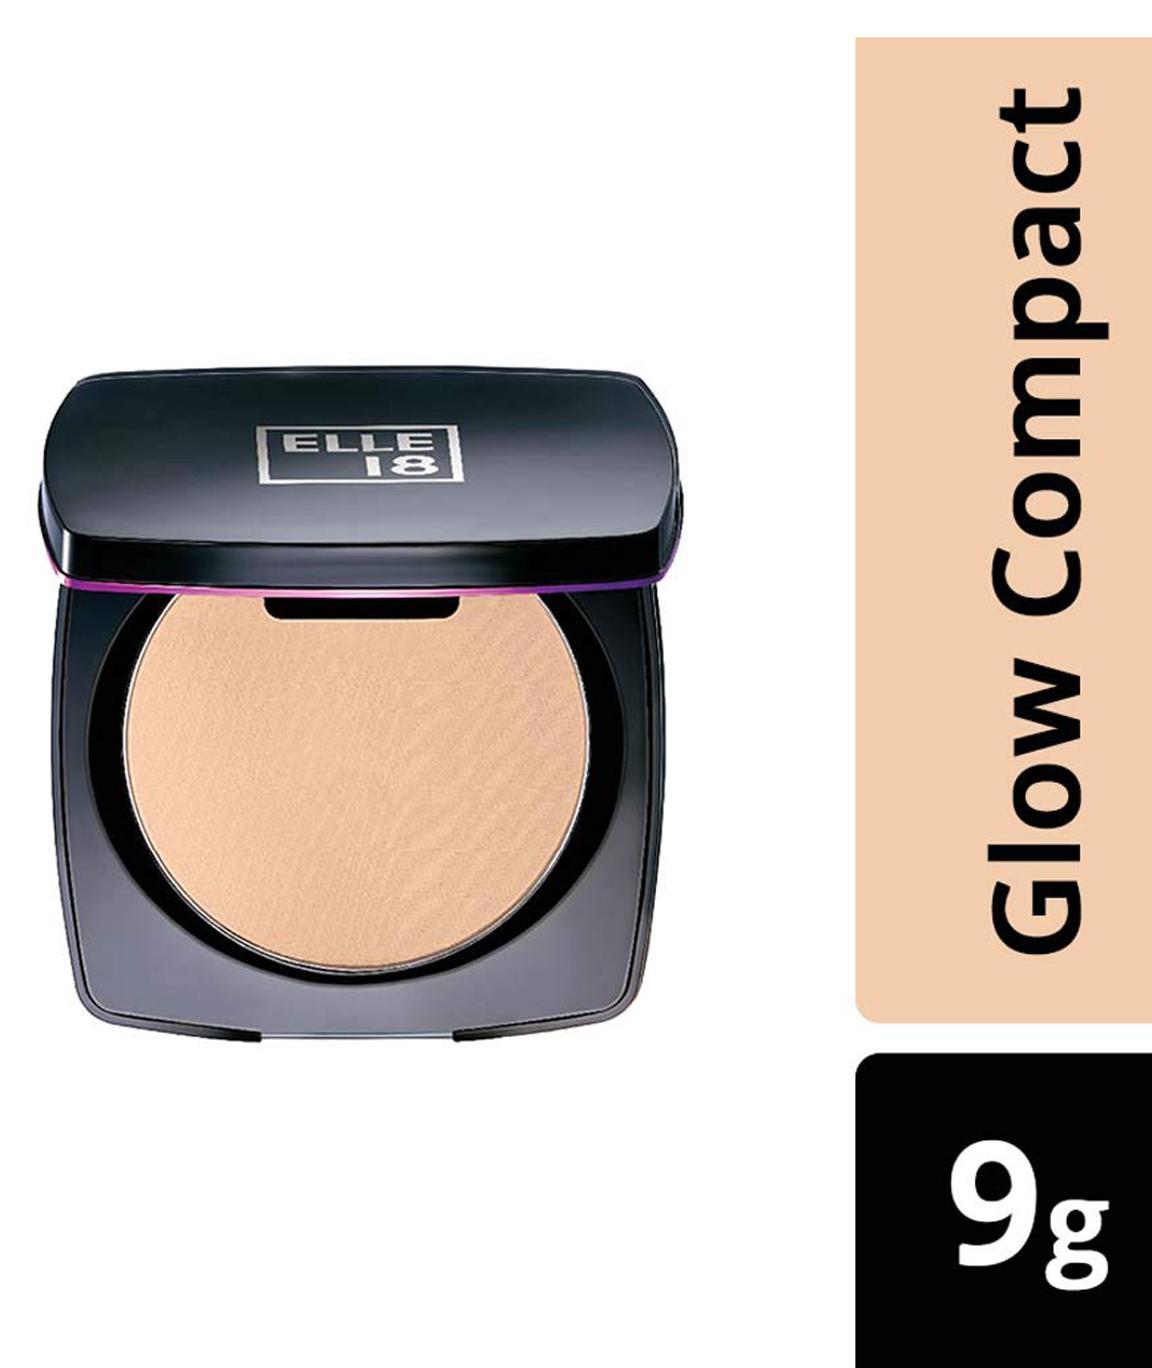 Elle 18 Lasting Glow Compact Pearl 9 g